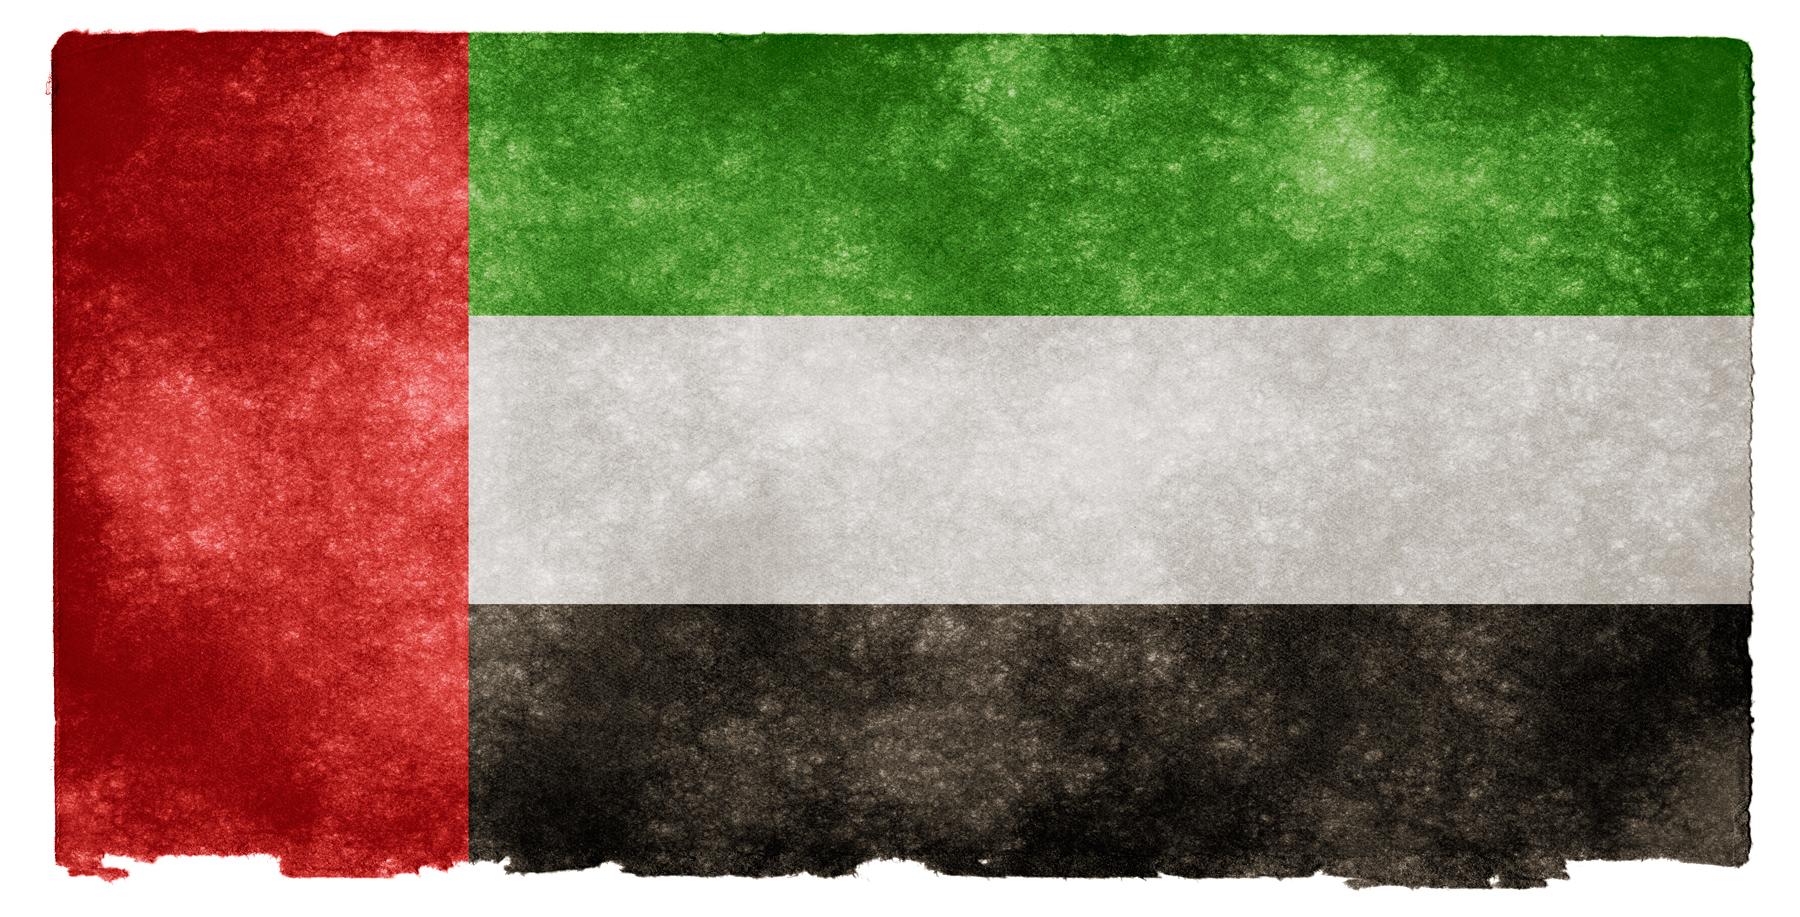 UAE Grunge Flag, Aged, Resource, Middle, Nation, HQ Photo